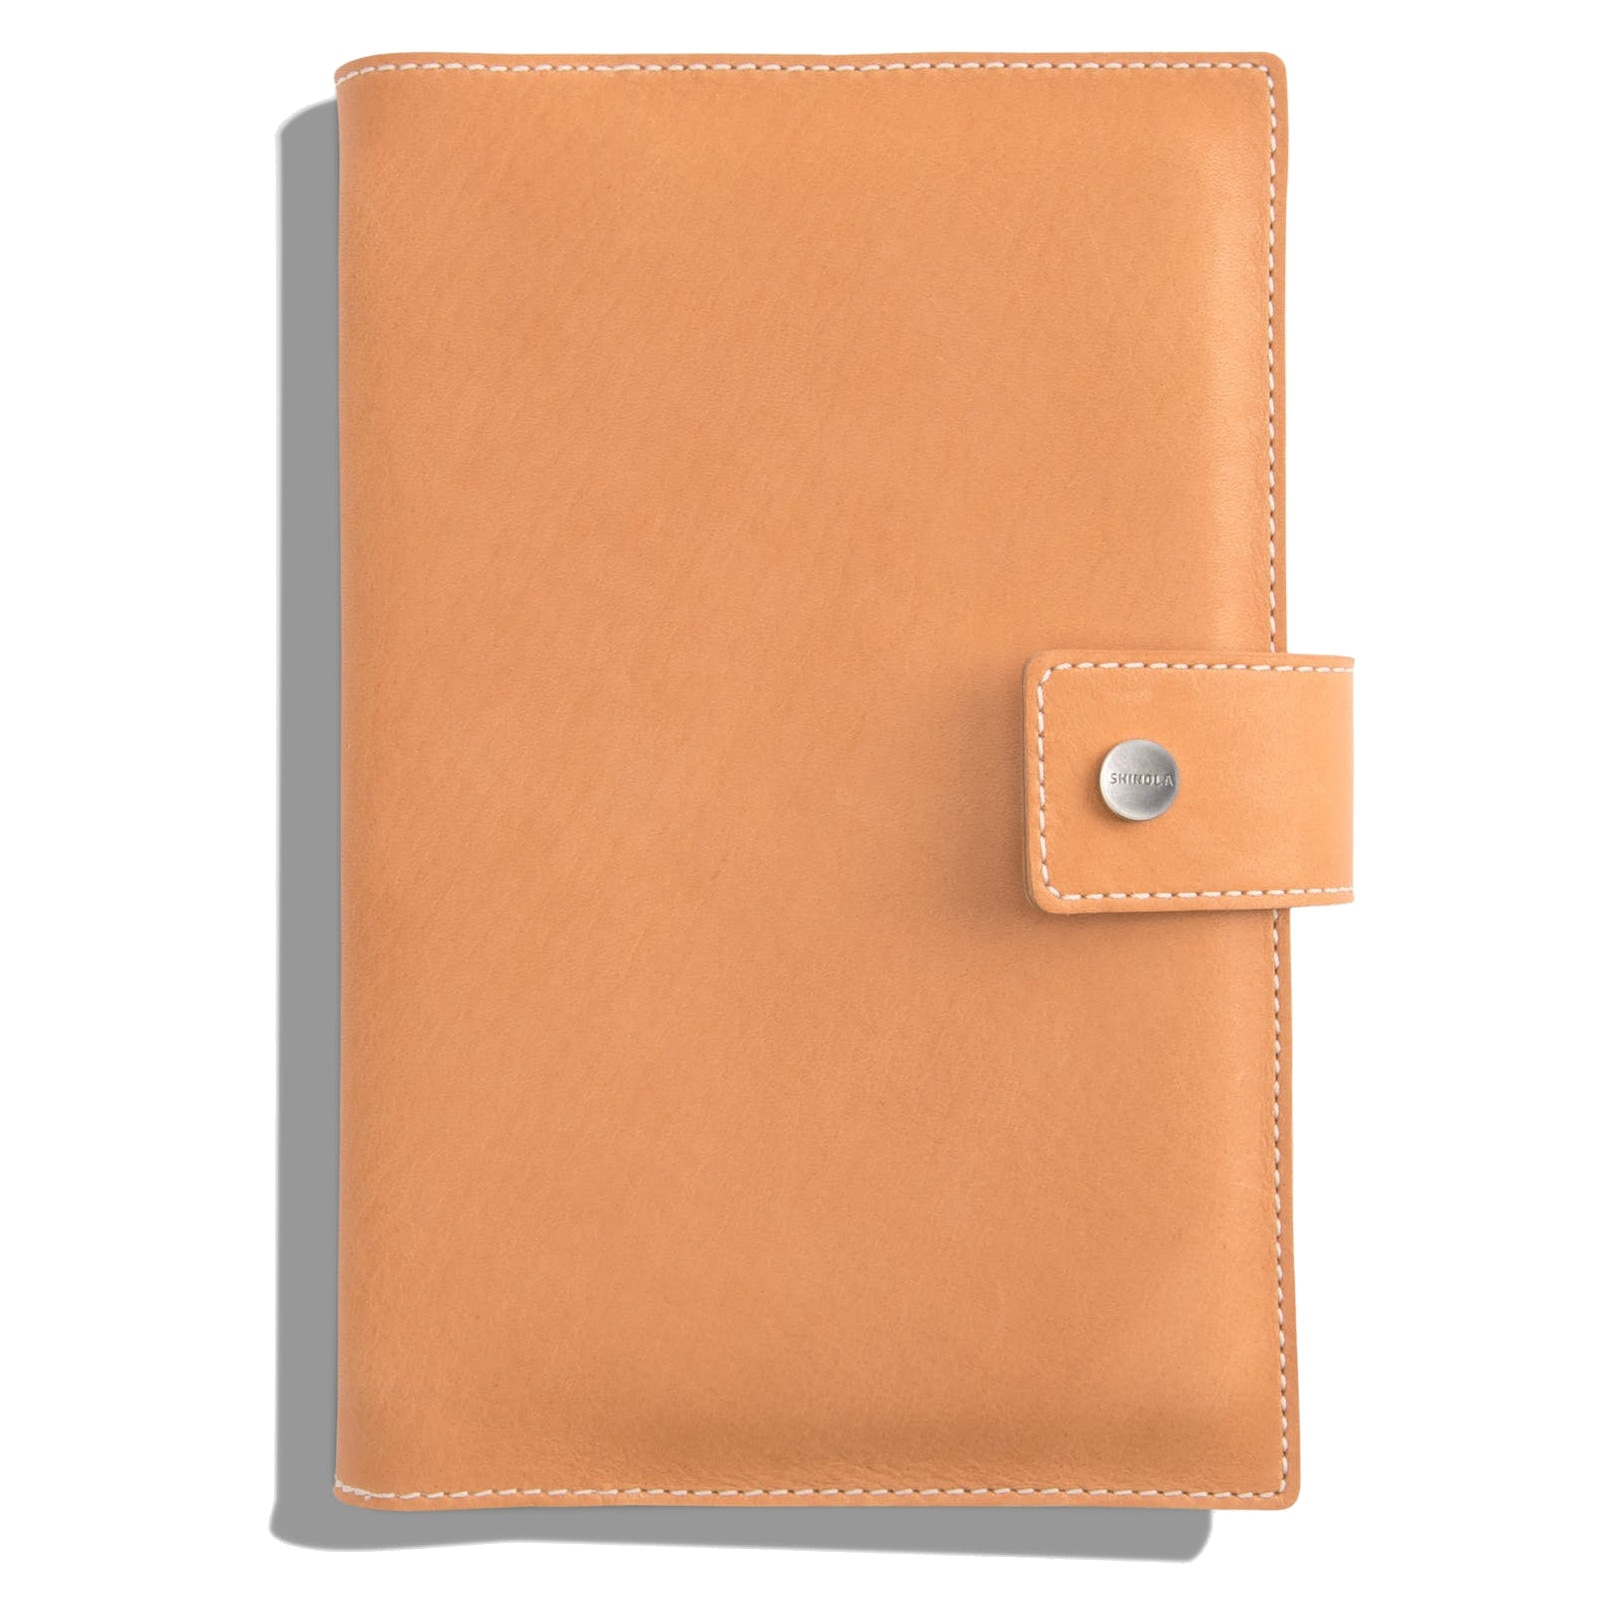 Shinola Premium Leather Medium Journal   iPad Mini Table Cover Choose your color-Chili by Shinola